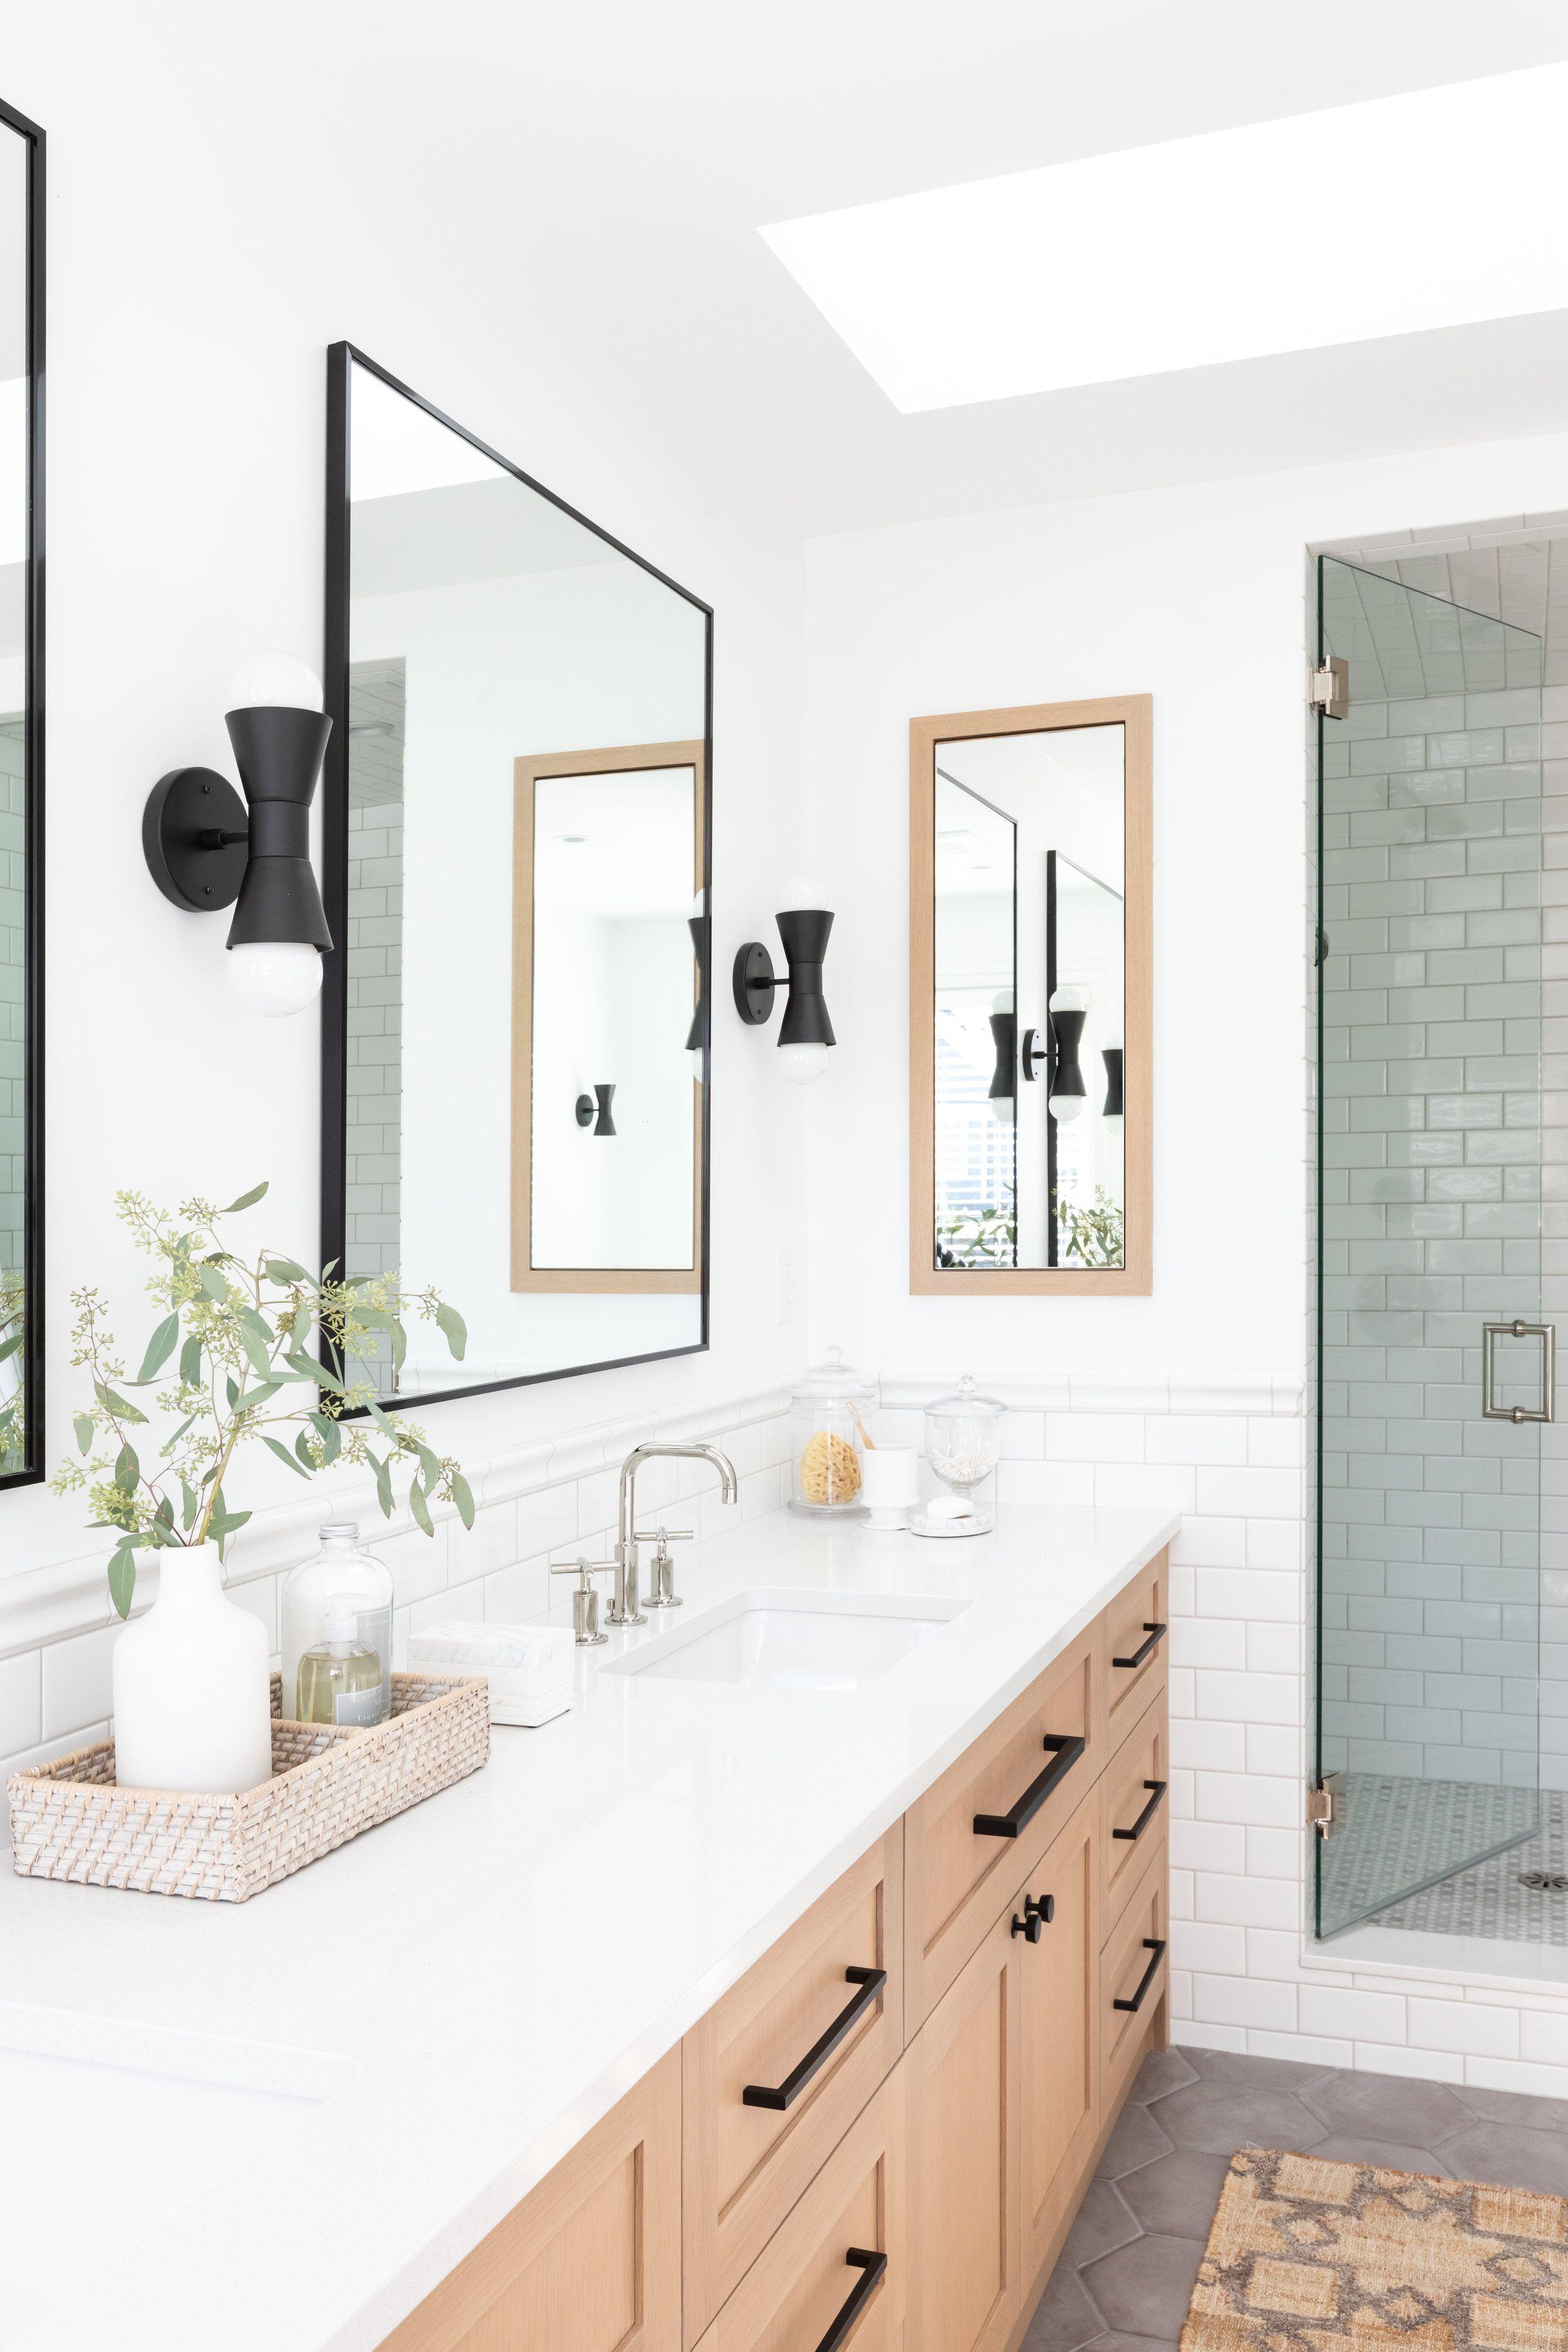 White Bathroom Bathroom With Brack Mirrors And Lighting Wood